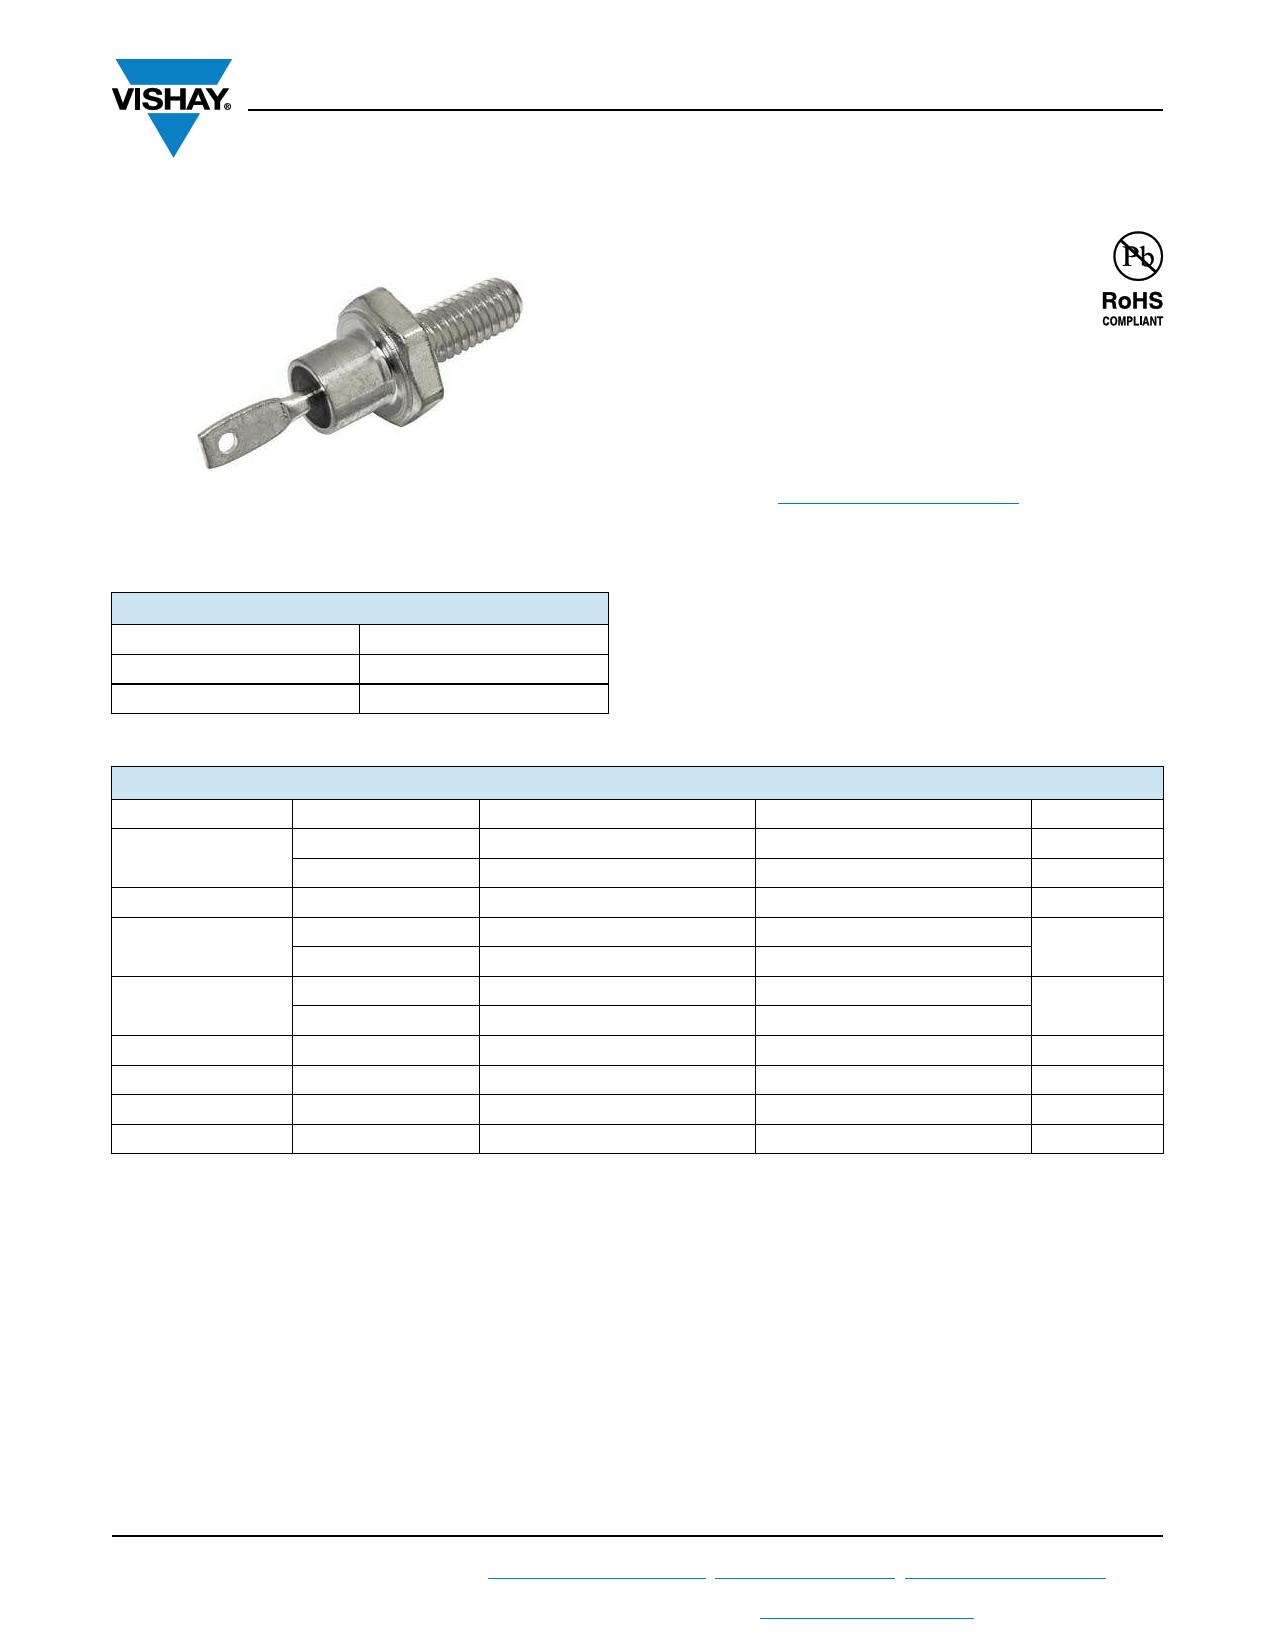 VS-1N3882 datasheet